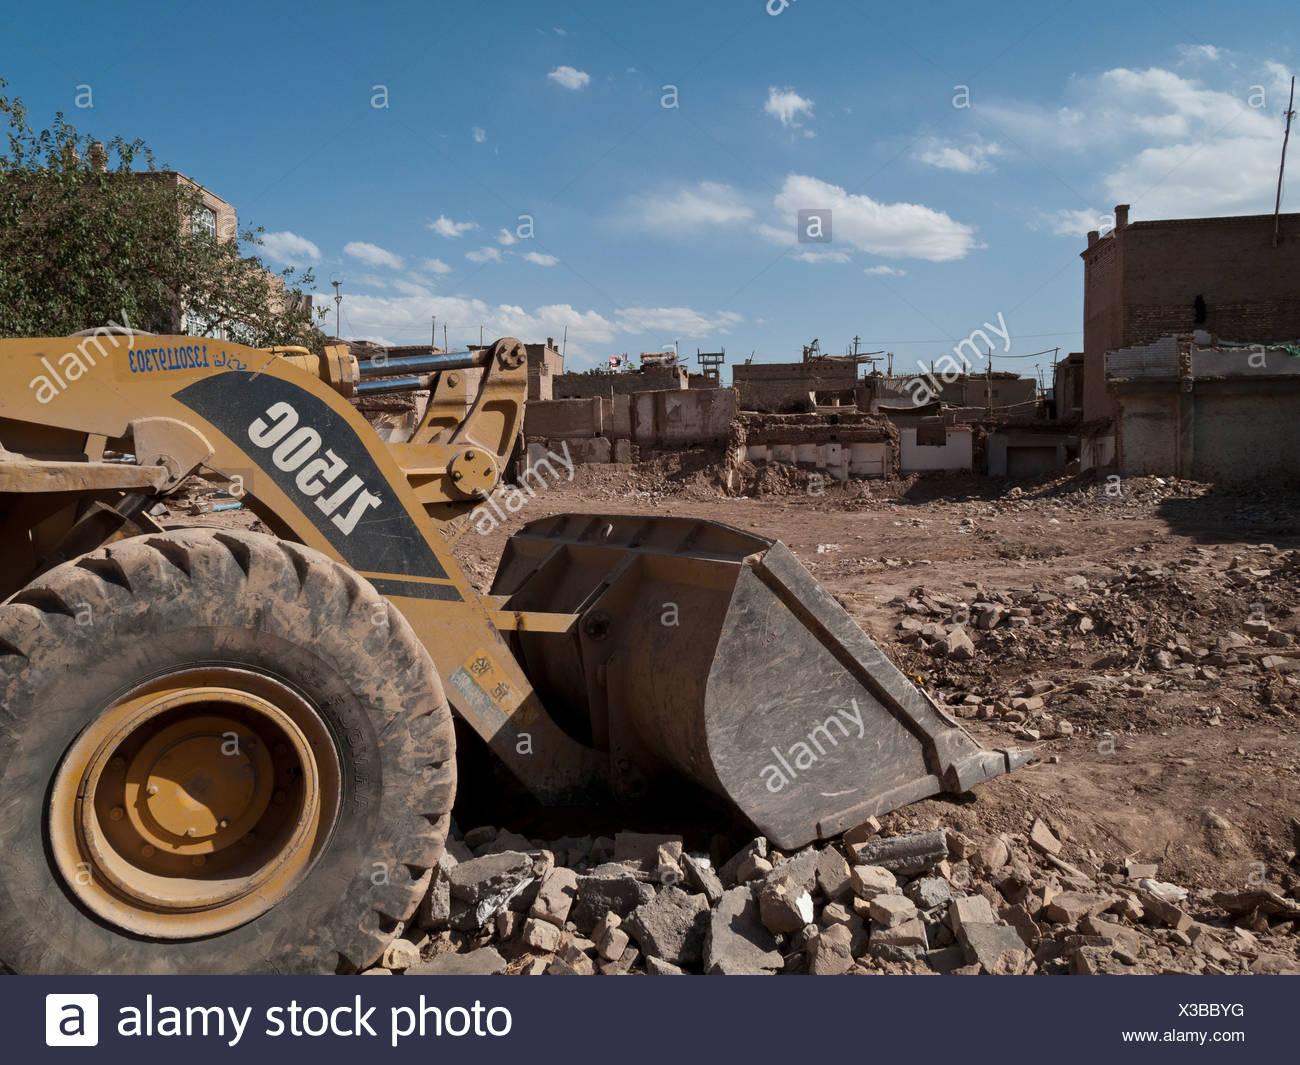 Kashgar, the capital of Uigur culture, demolished by Chinese bulldozers, Xinjiang, China, Asia - Stock Image